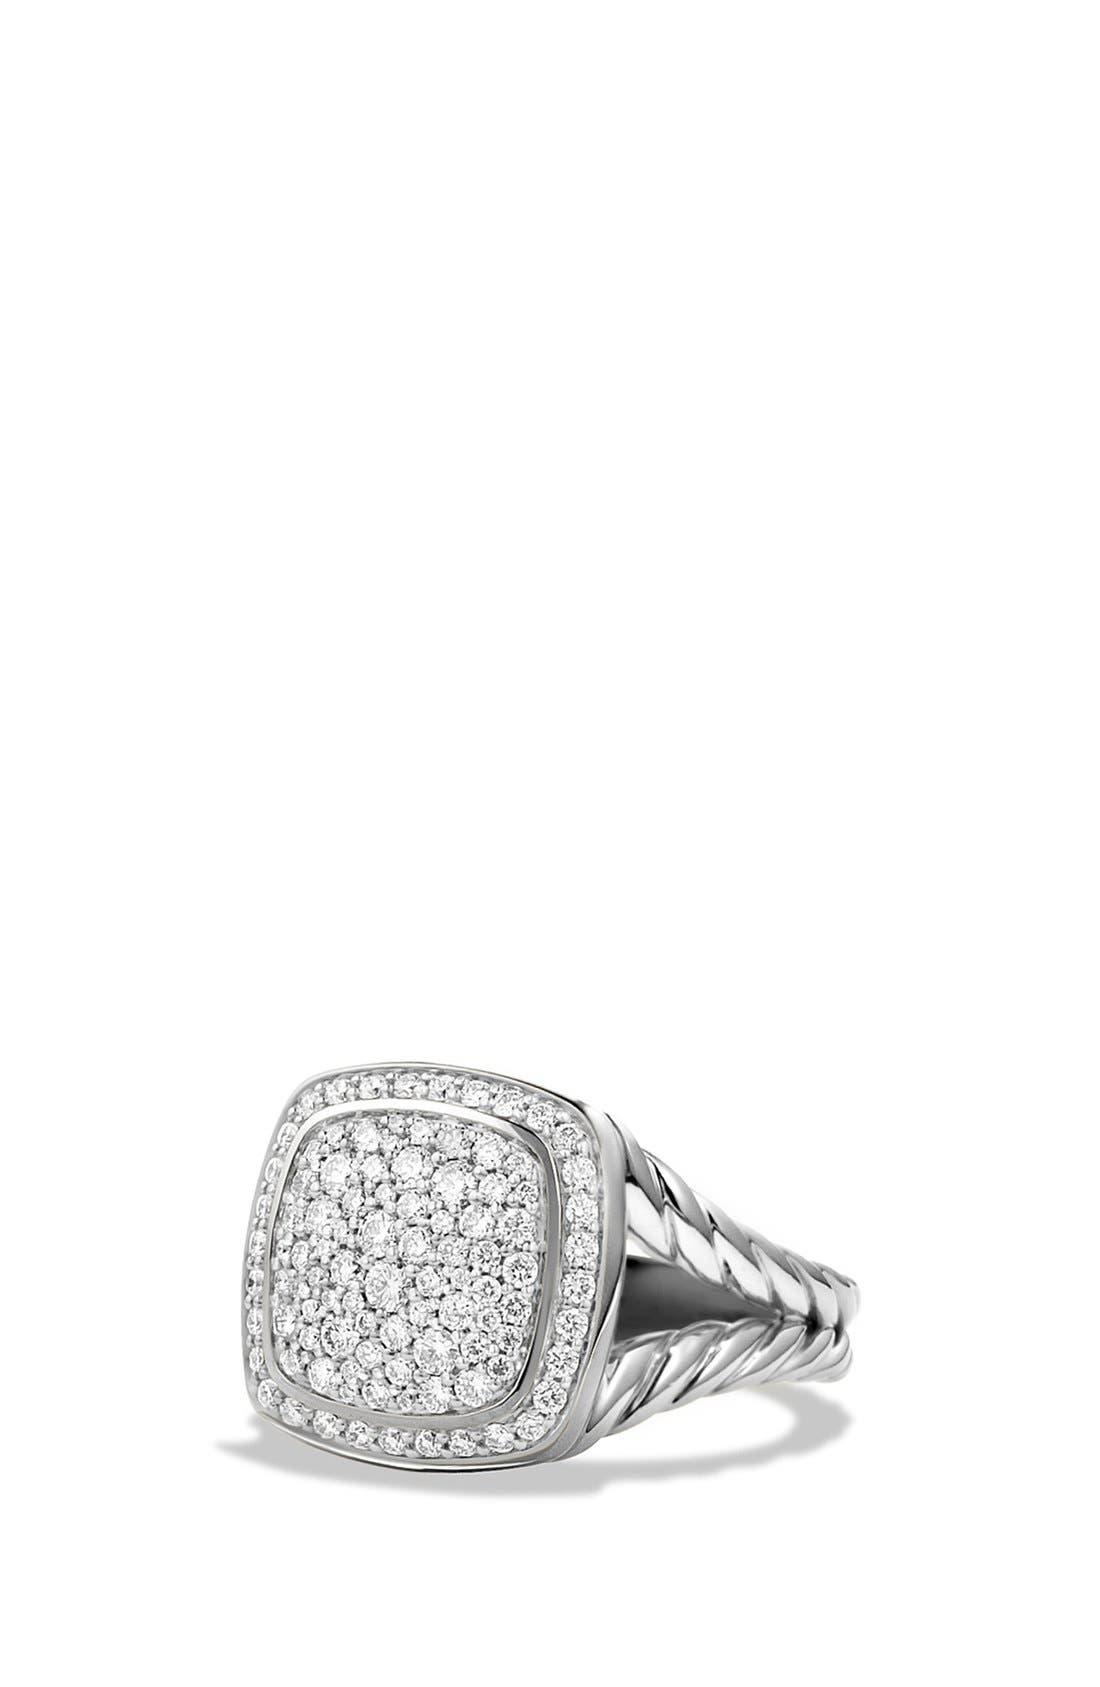 Main Image - David Yurman'Albion' Ring with Diamonds